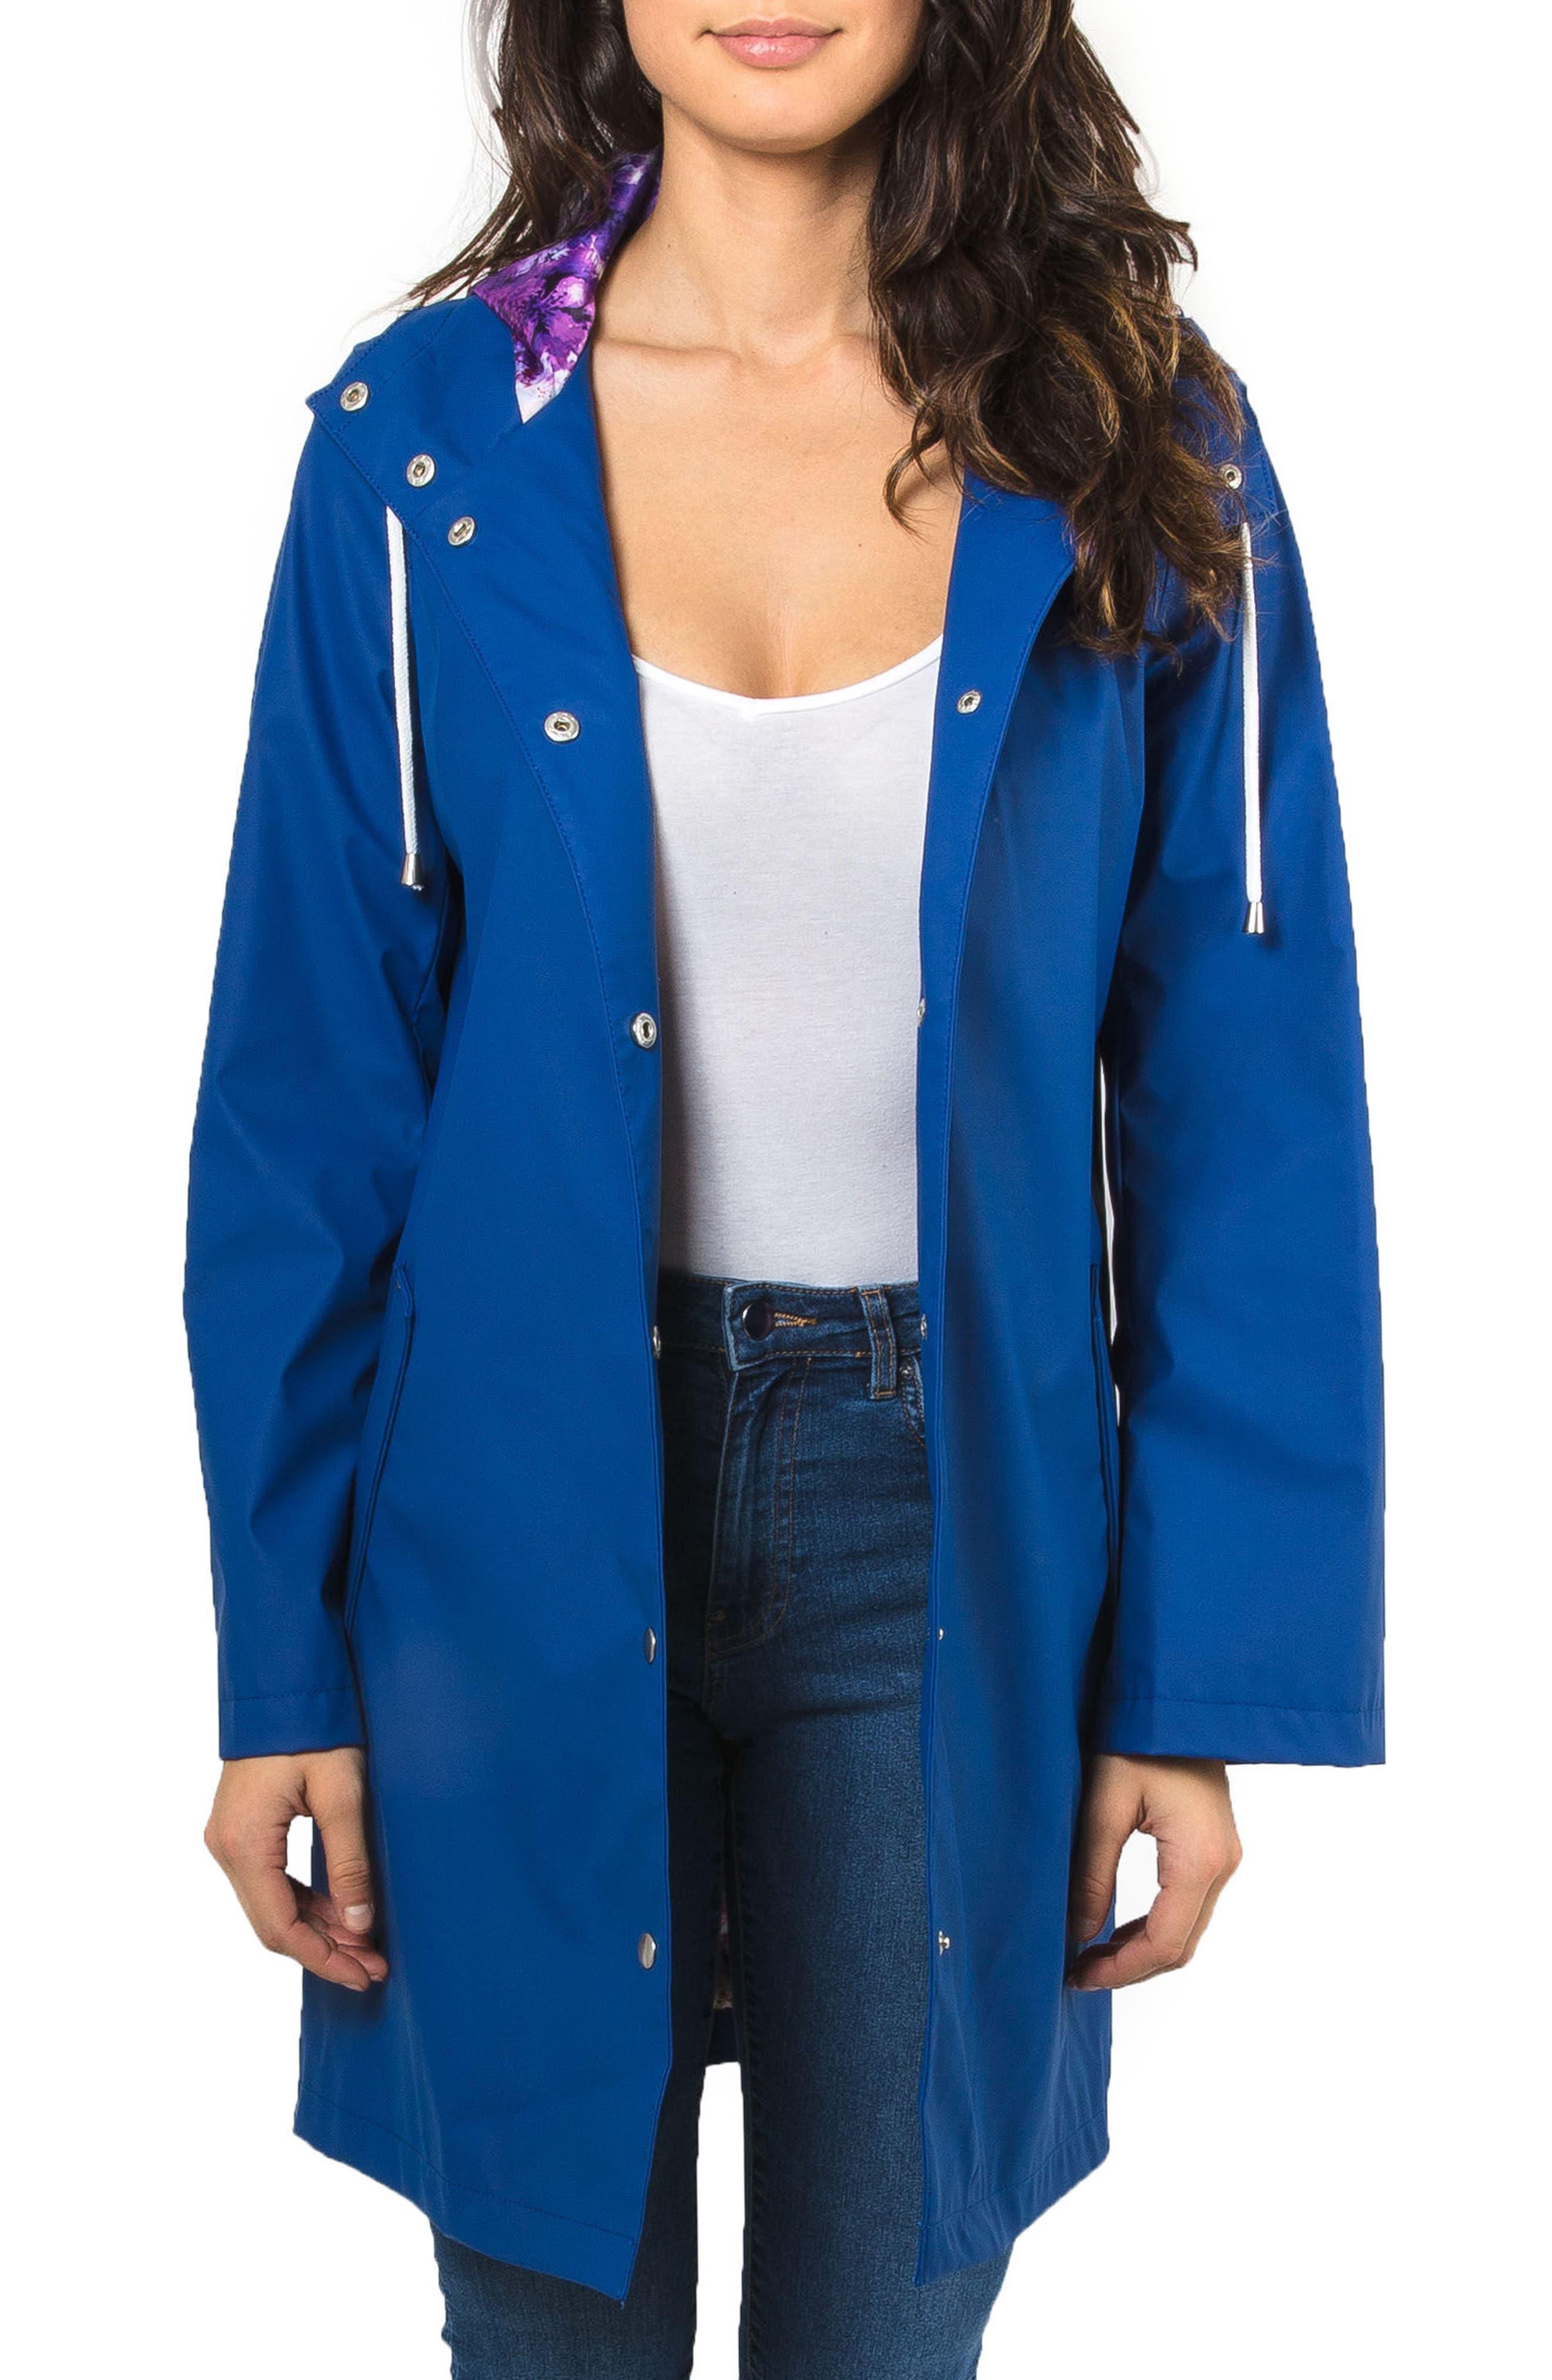 Badgley Mischka Coated Raincoat